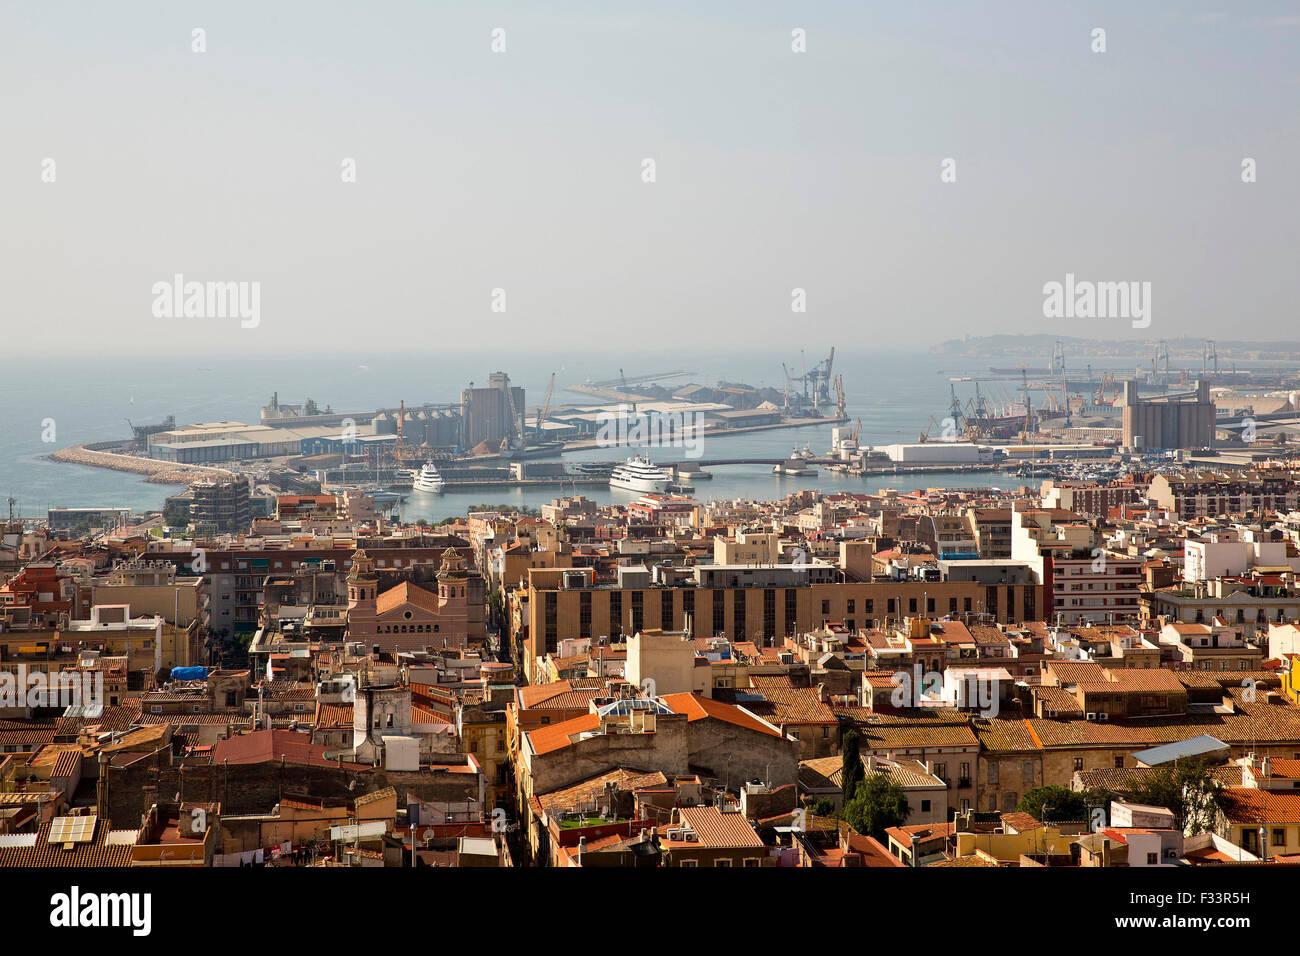 Industrial harbour, Tarragona, Catalonia - Stock Image